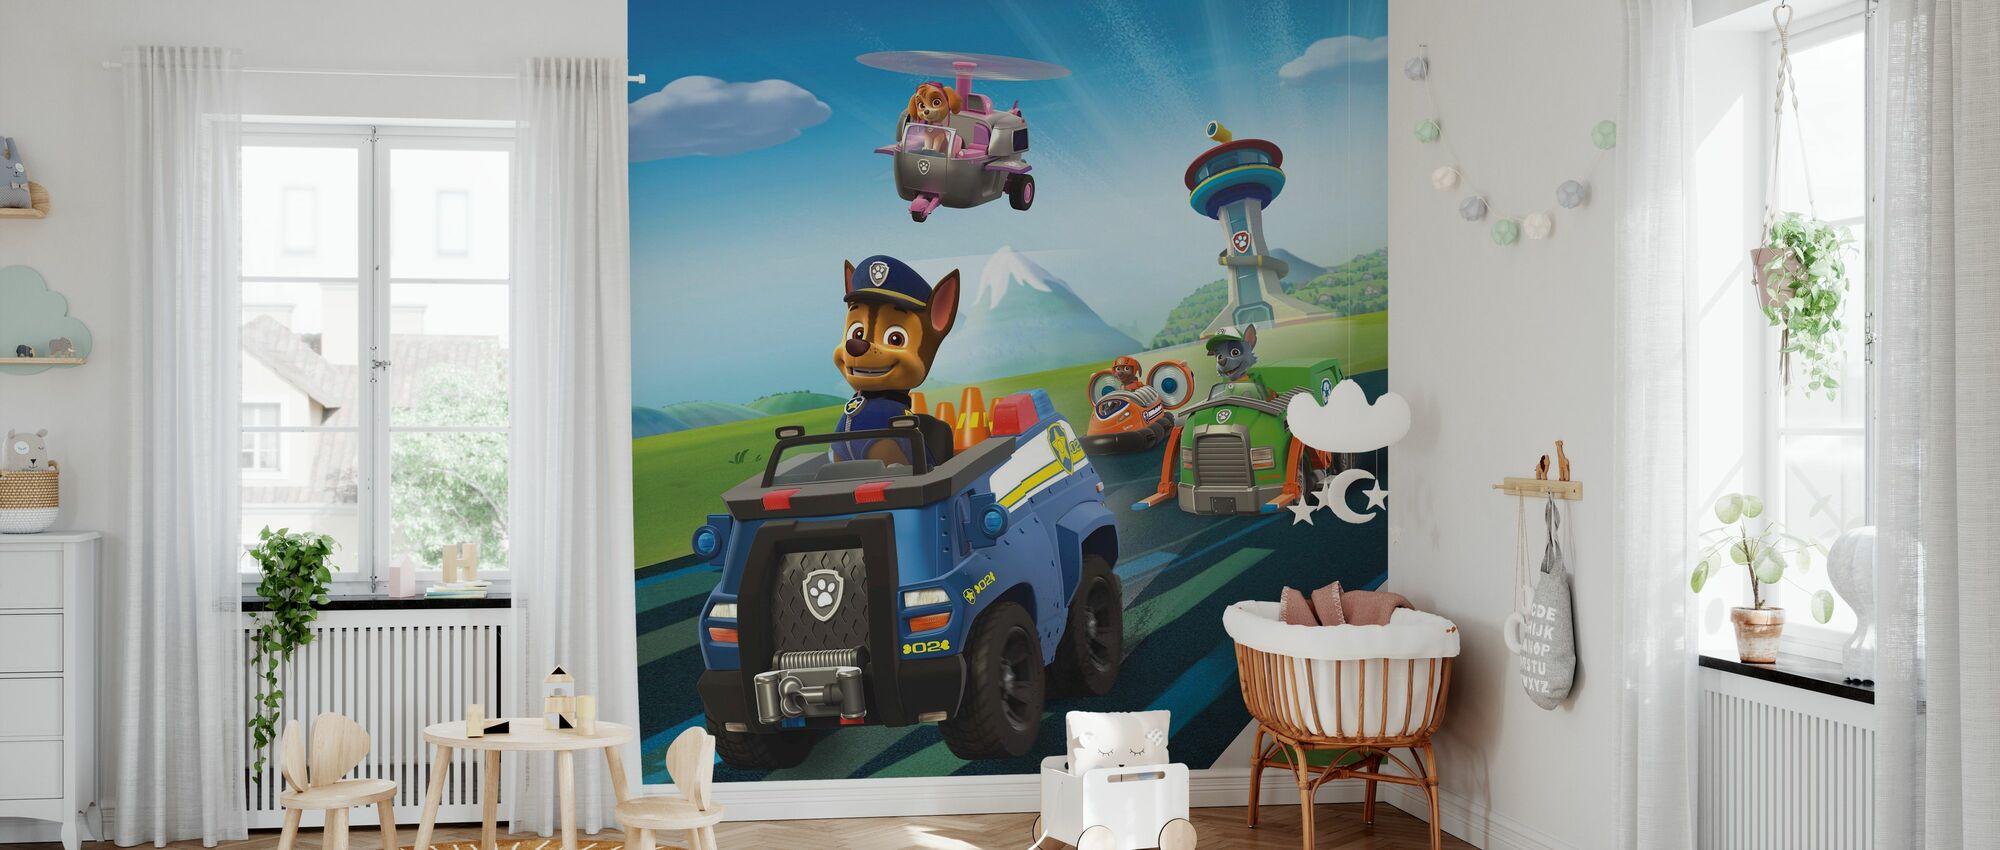 PAW Patrol - Lass uns rollen - Tapete - Babyzimmer